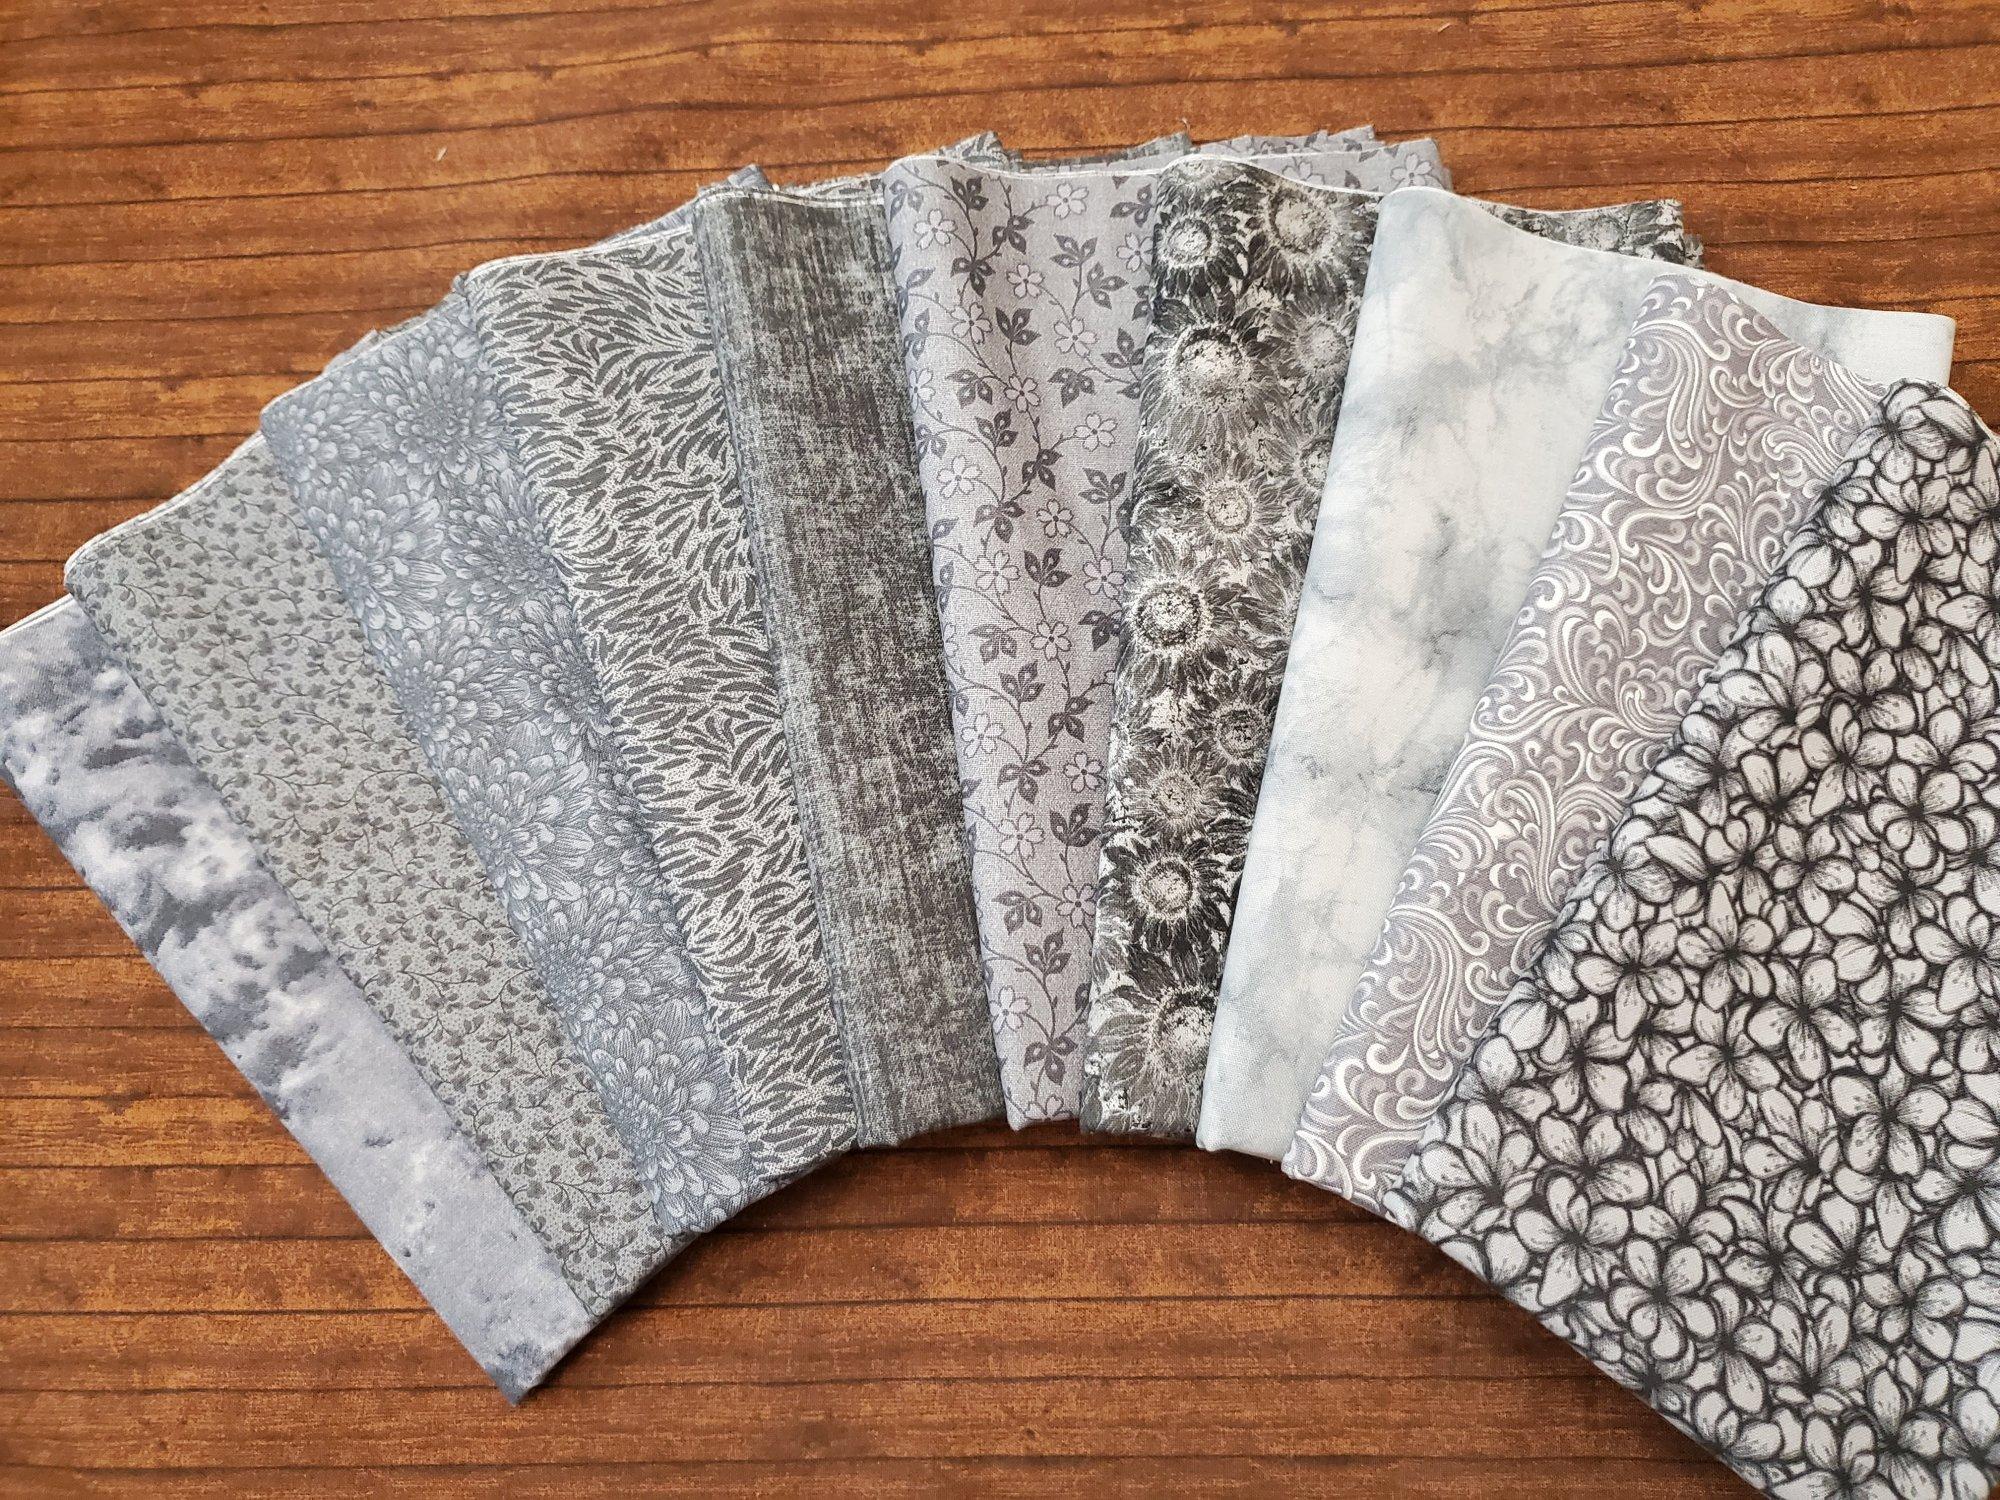 Mixed Grays - Rachael's Picks - 10 Piece Half Yard Bundle Pack